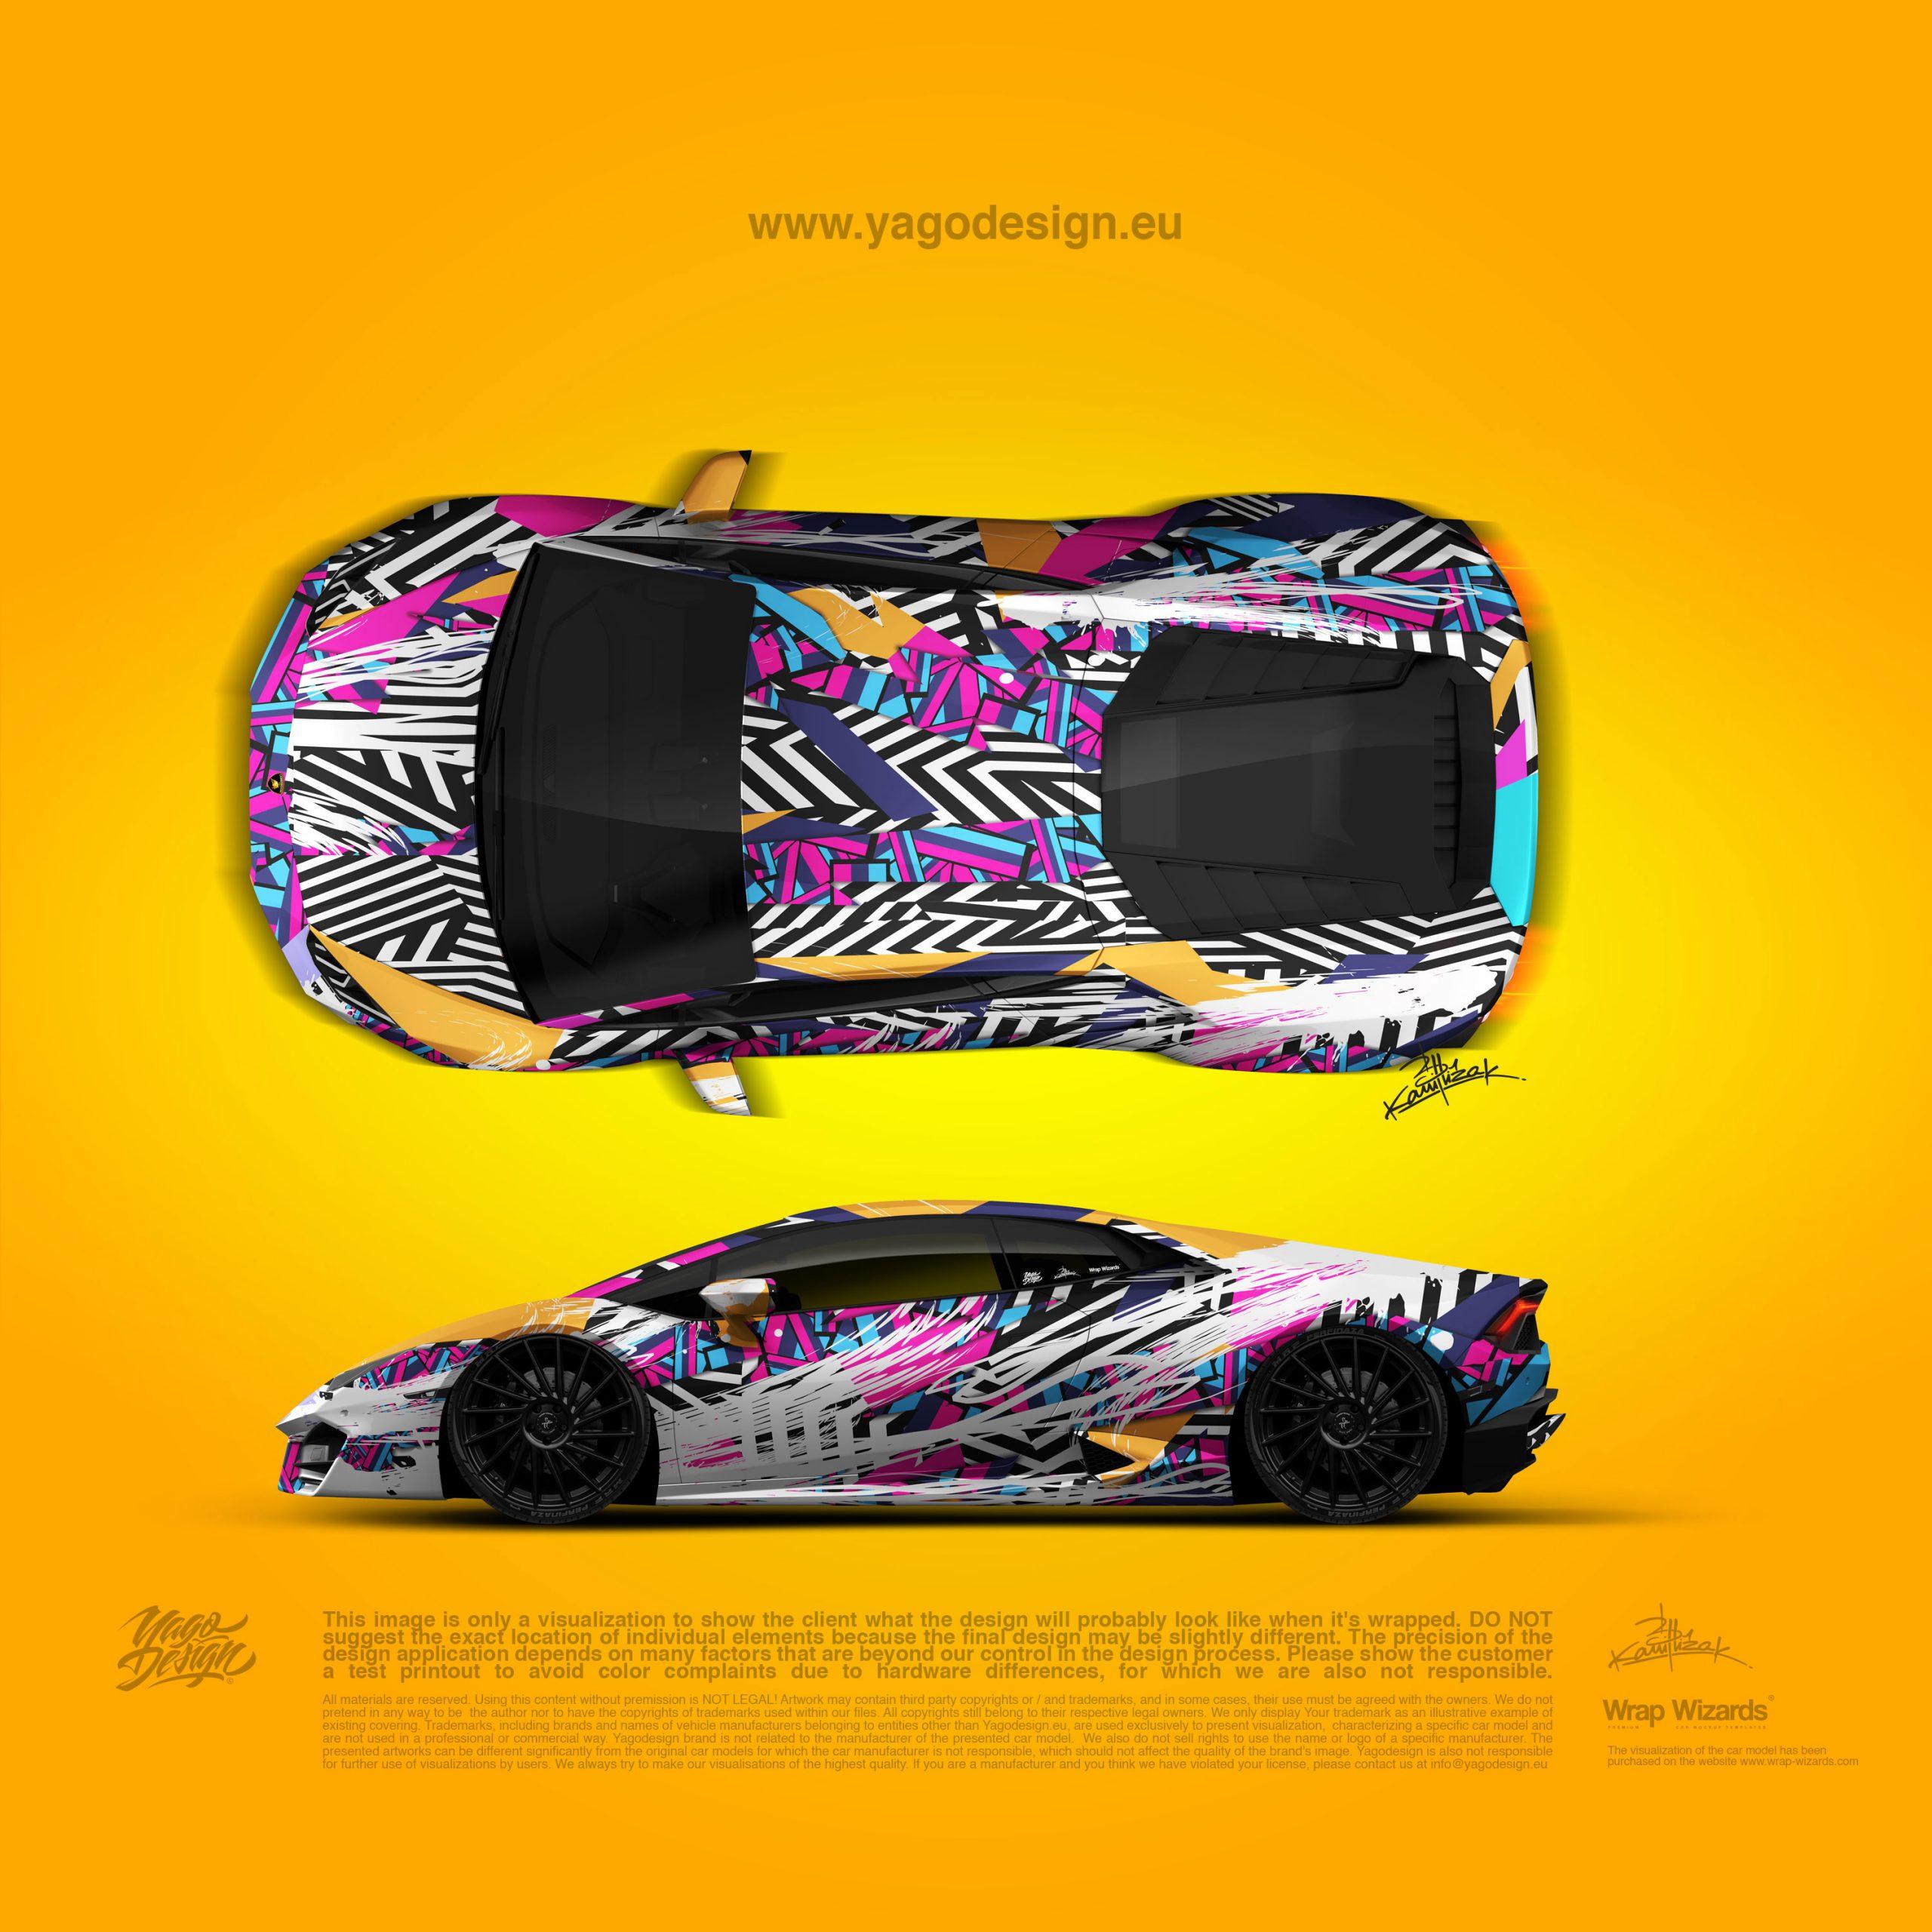 Lamborghini-Huracan-by-Yagodesign